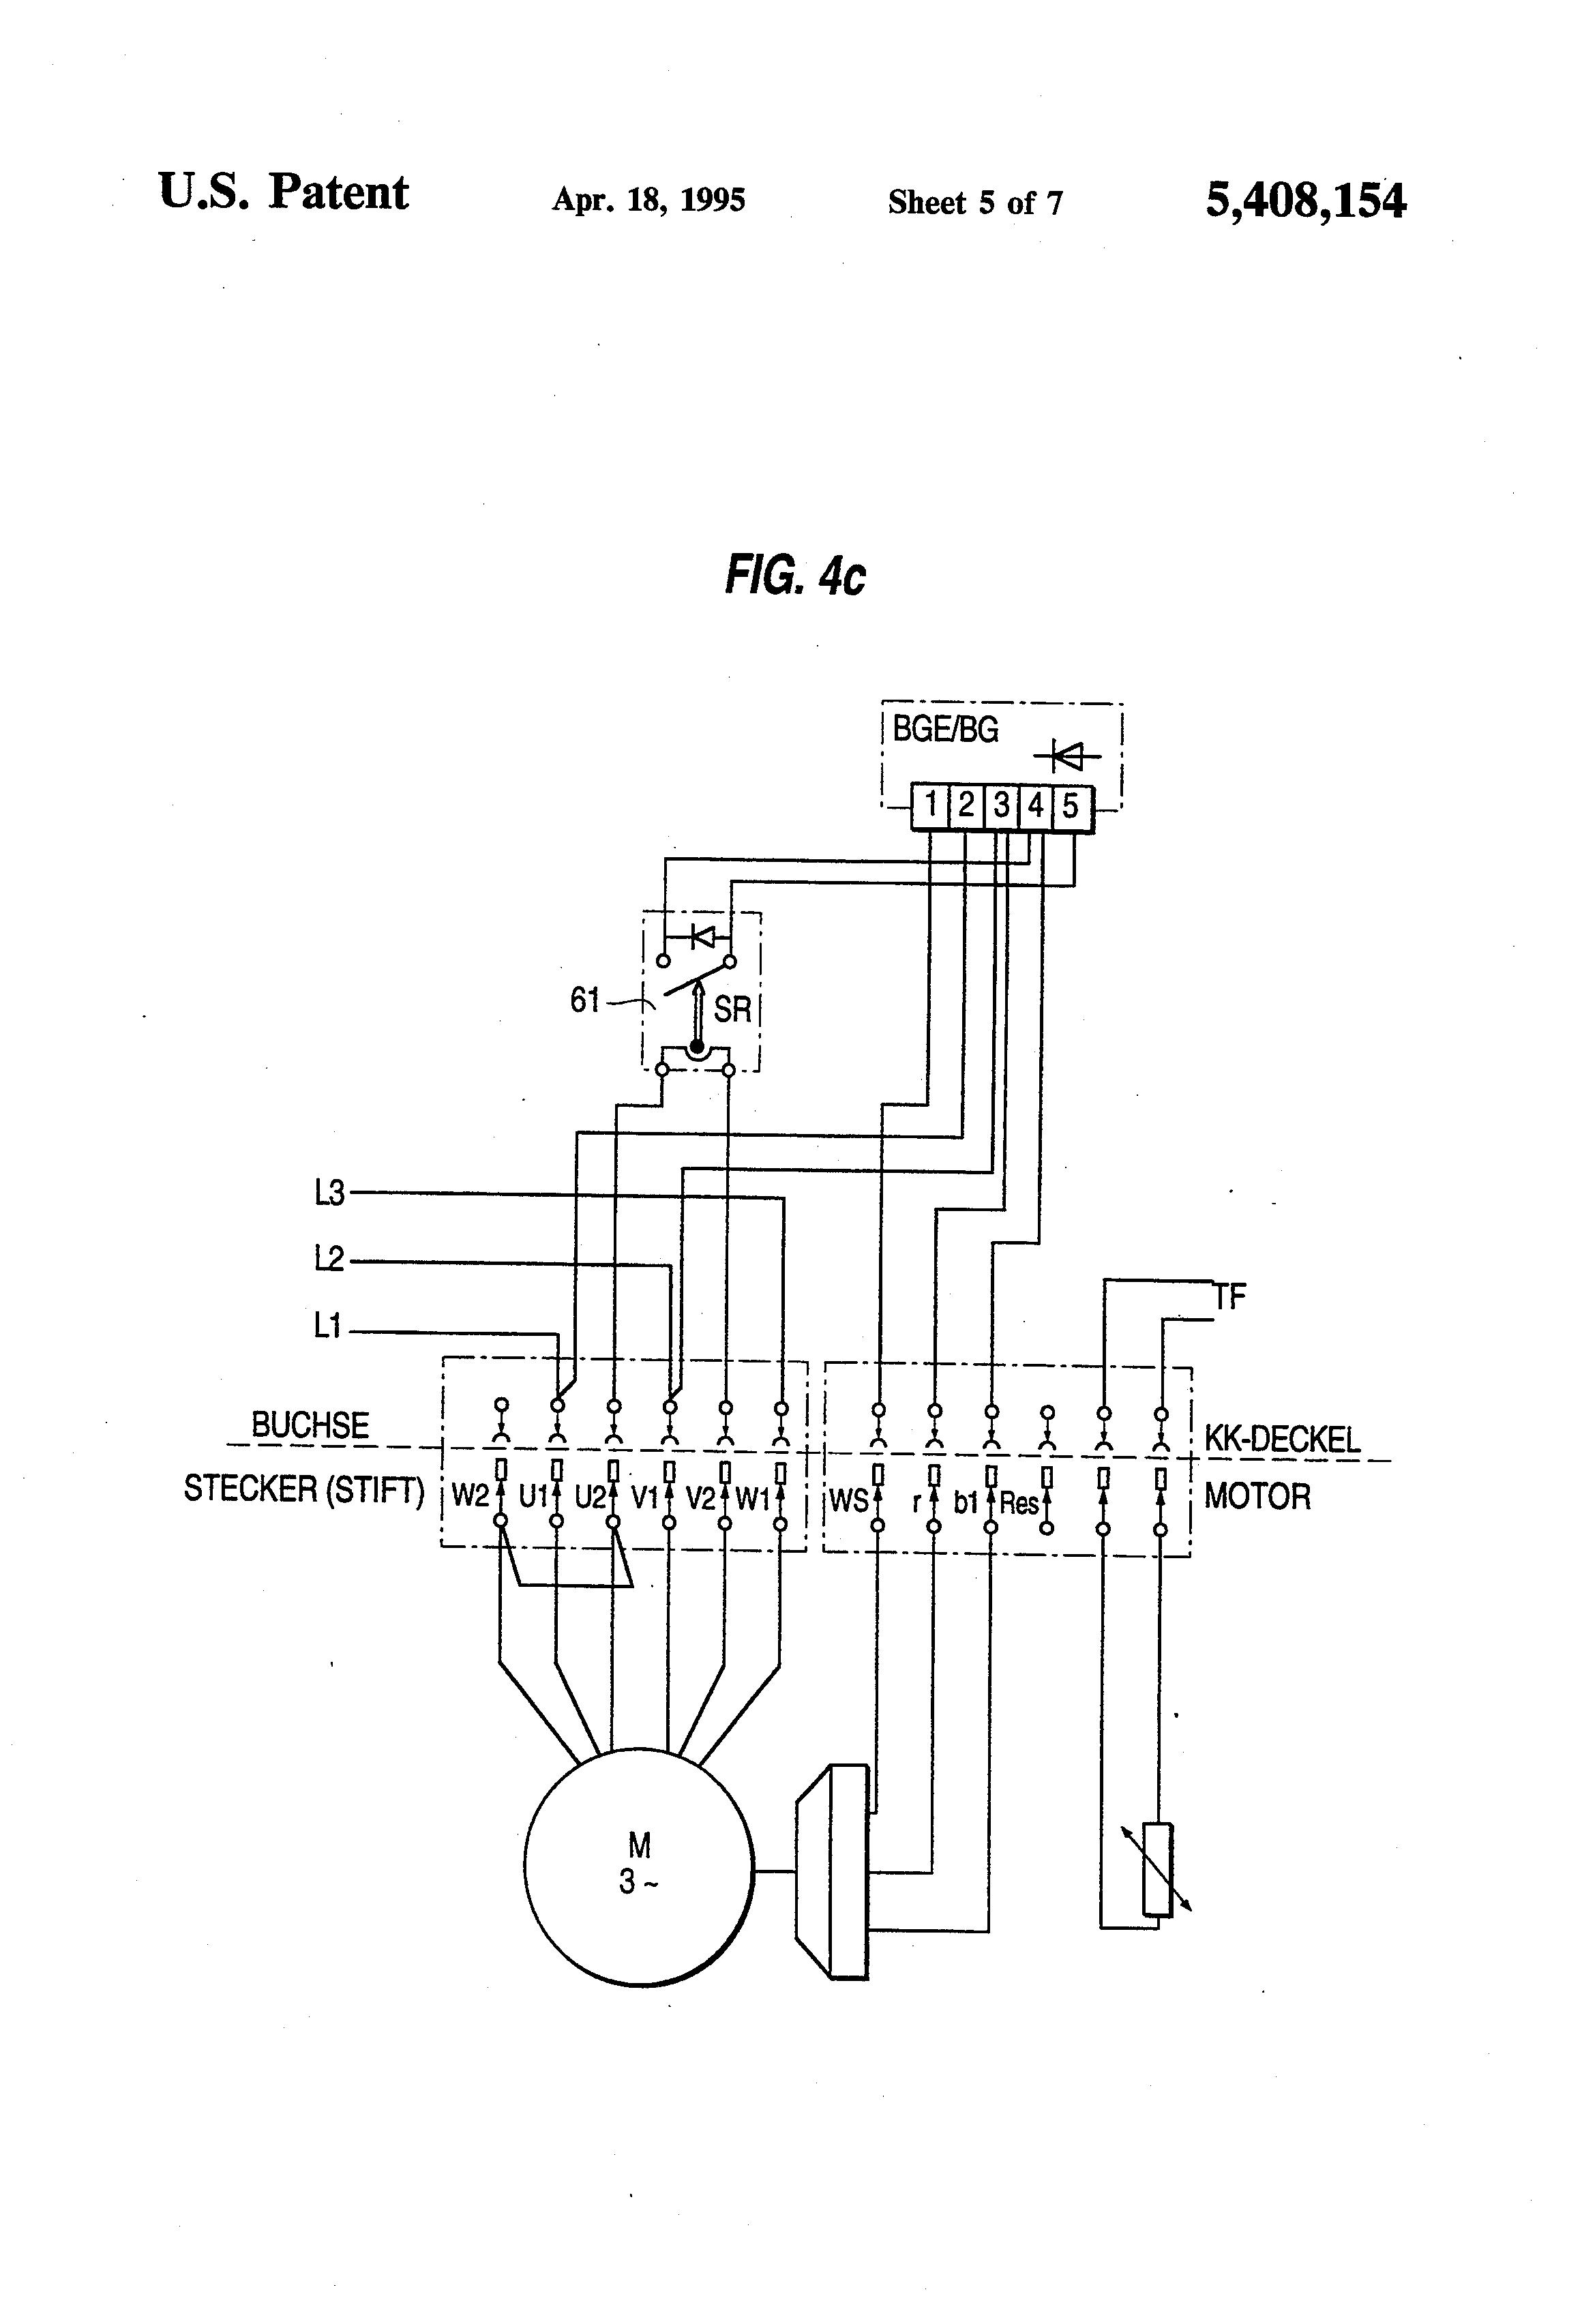 Gy 0076 Eurodrive Motor Wiring Diagram Sew Eurodrive Motor Wiring Diagram Wiring Diagram